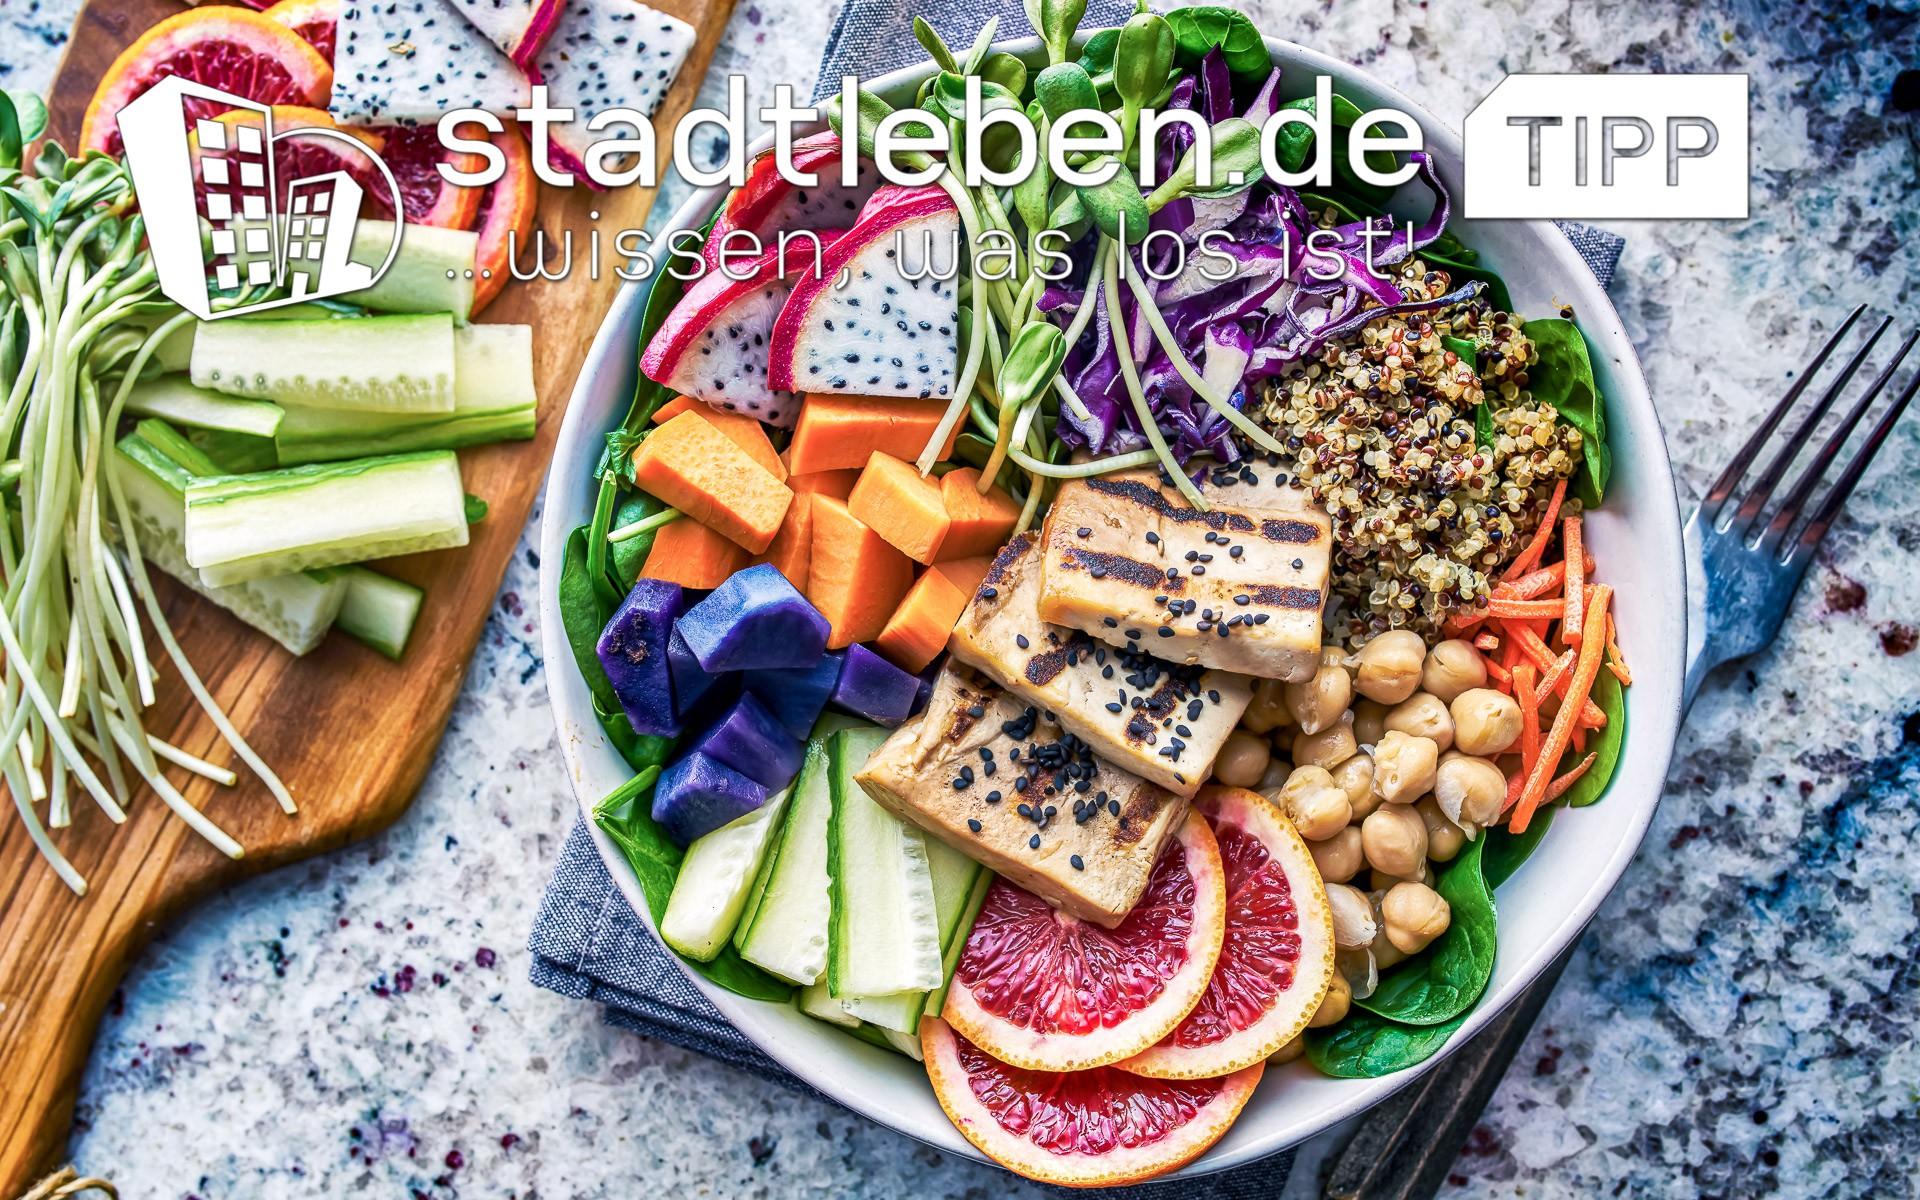 Gurke, Karotten, Kichererbse, Rotkohlsalat, Brot, Obst, Salat